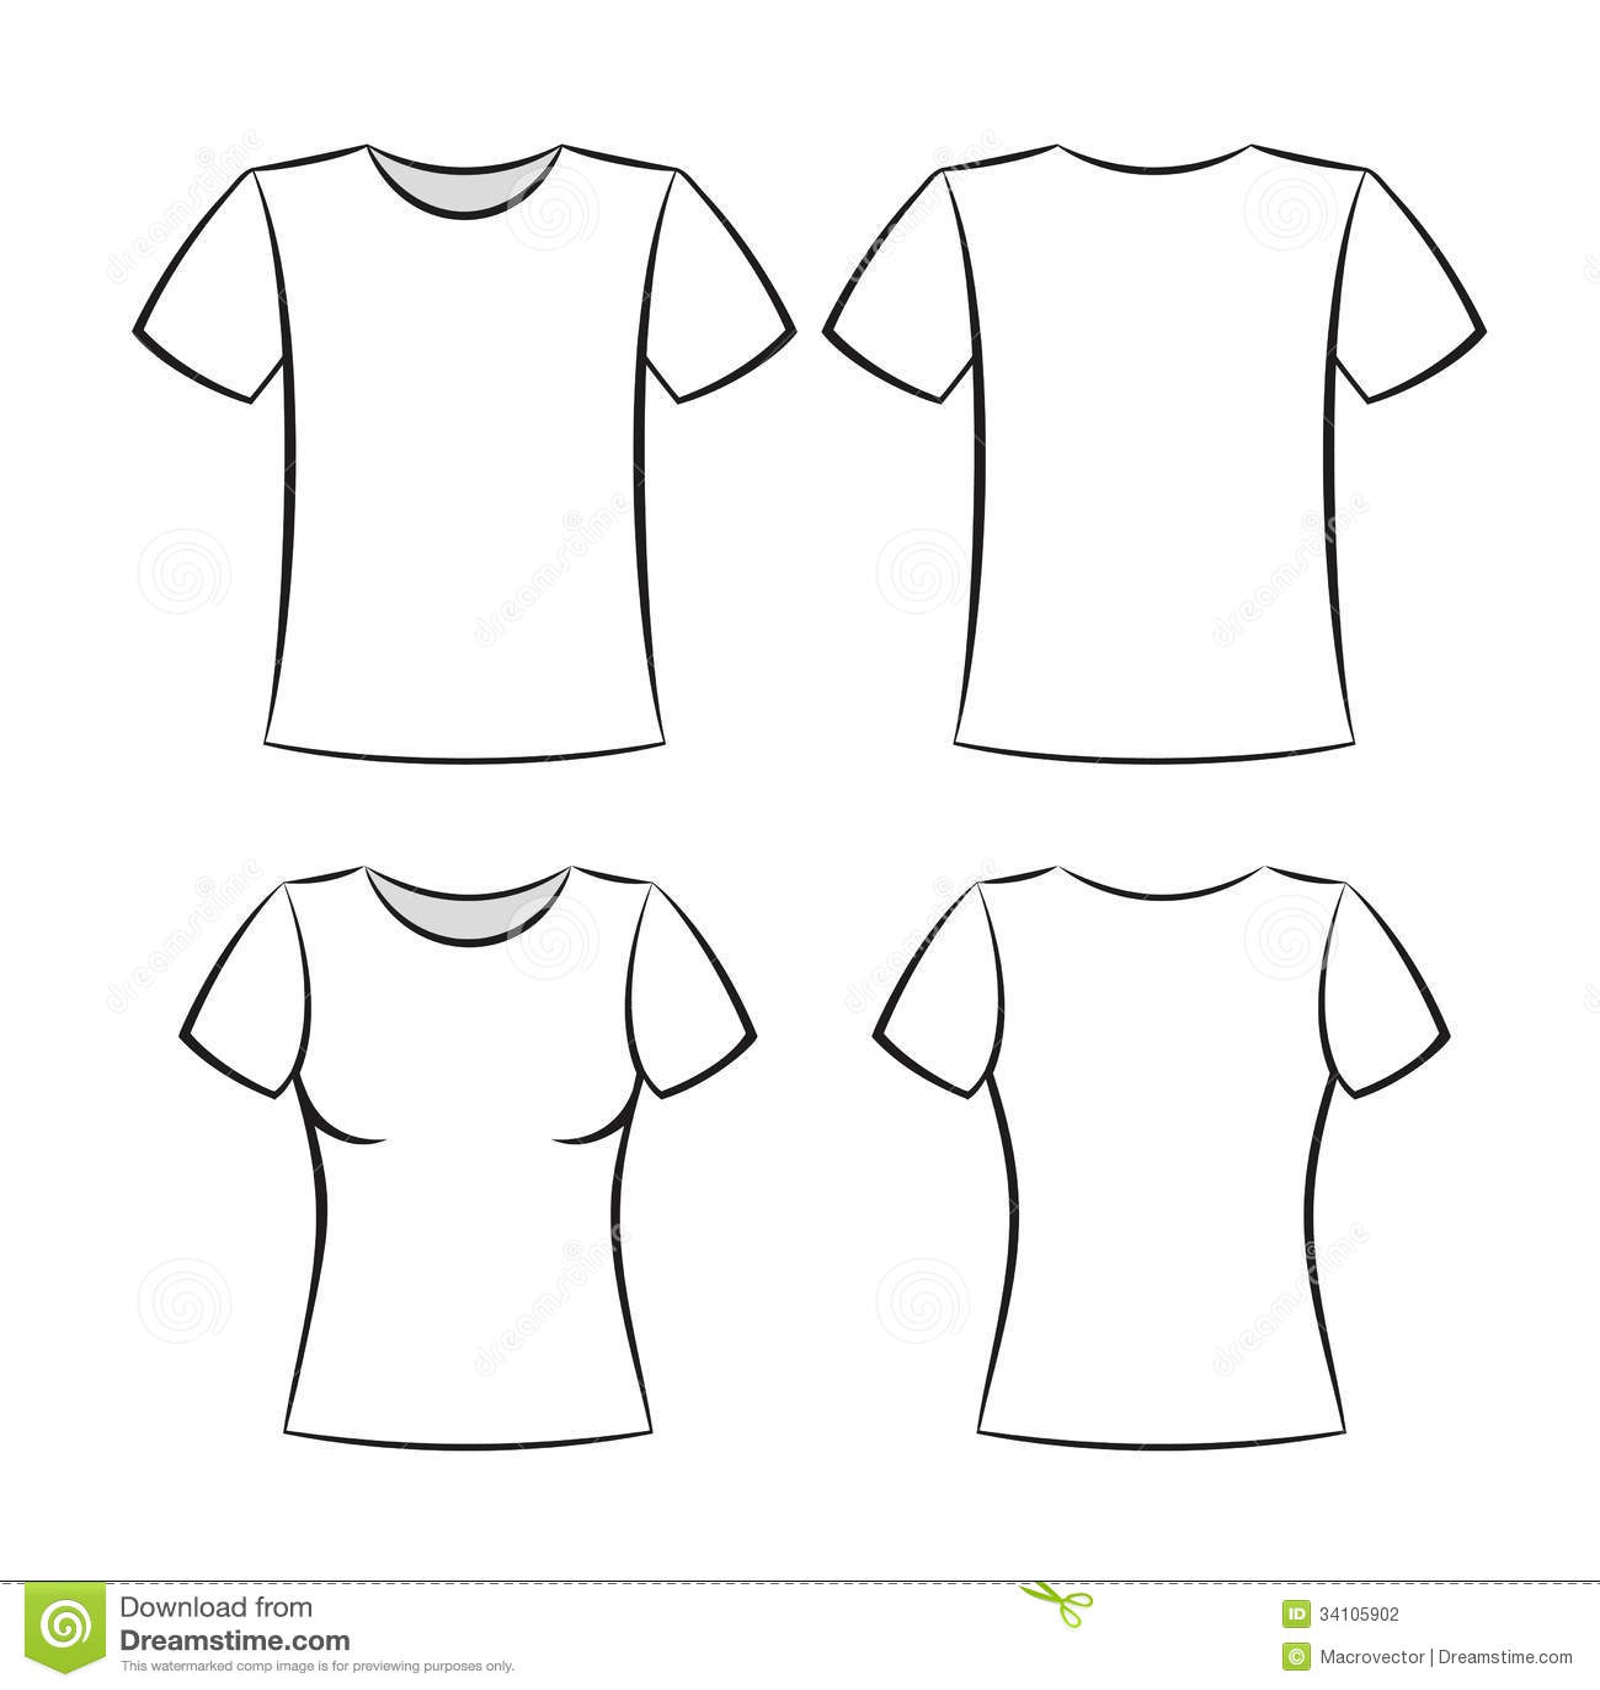 shirt Template Stock Photography - Image: 34105902